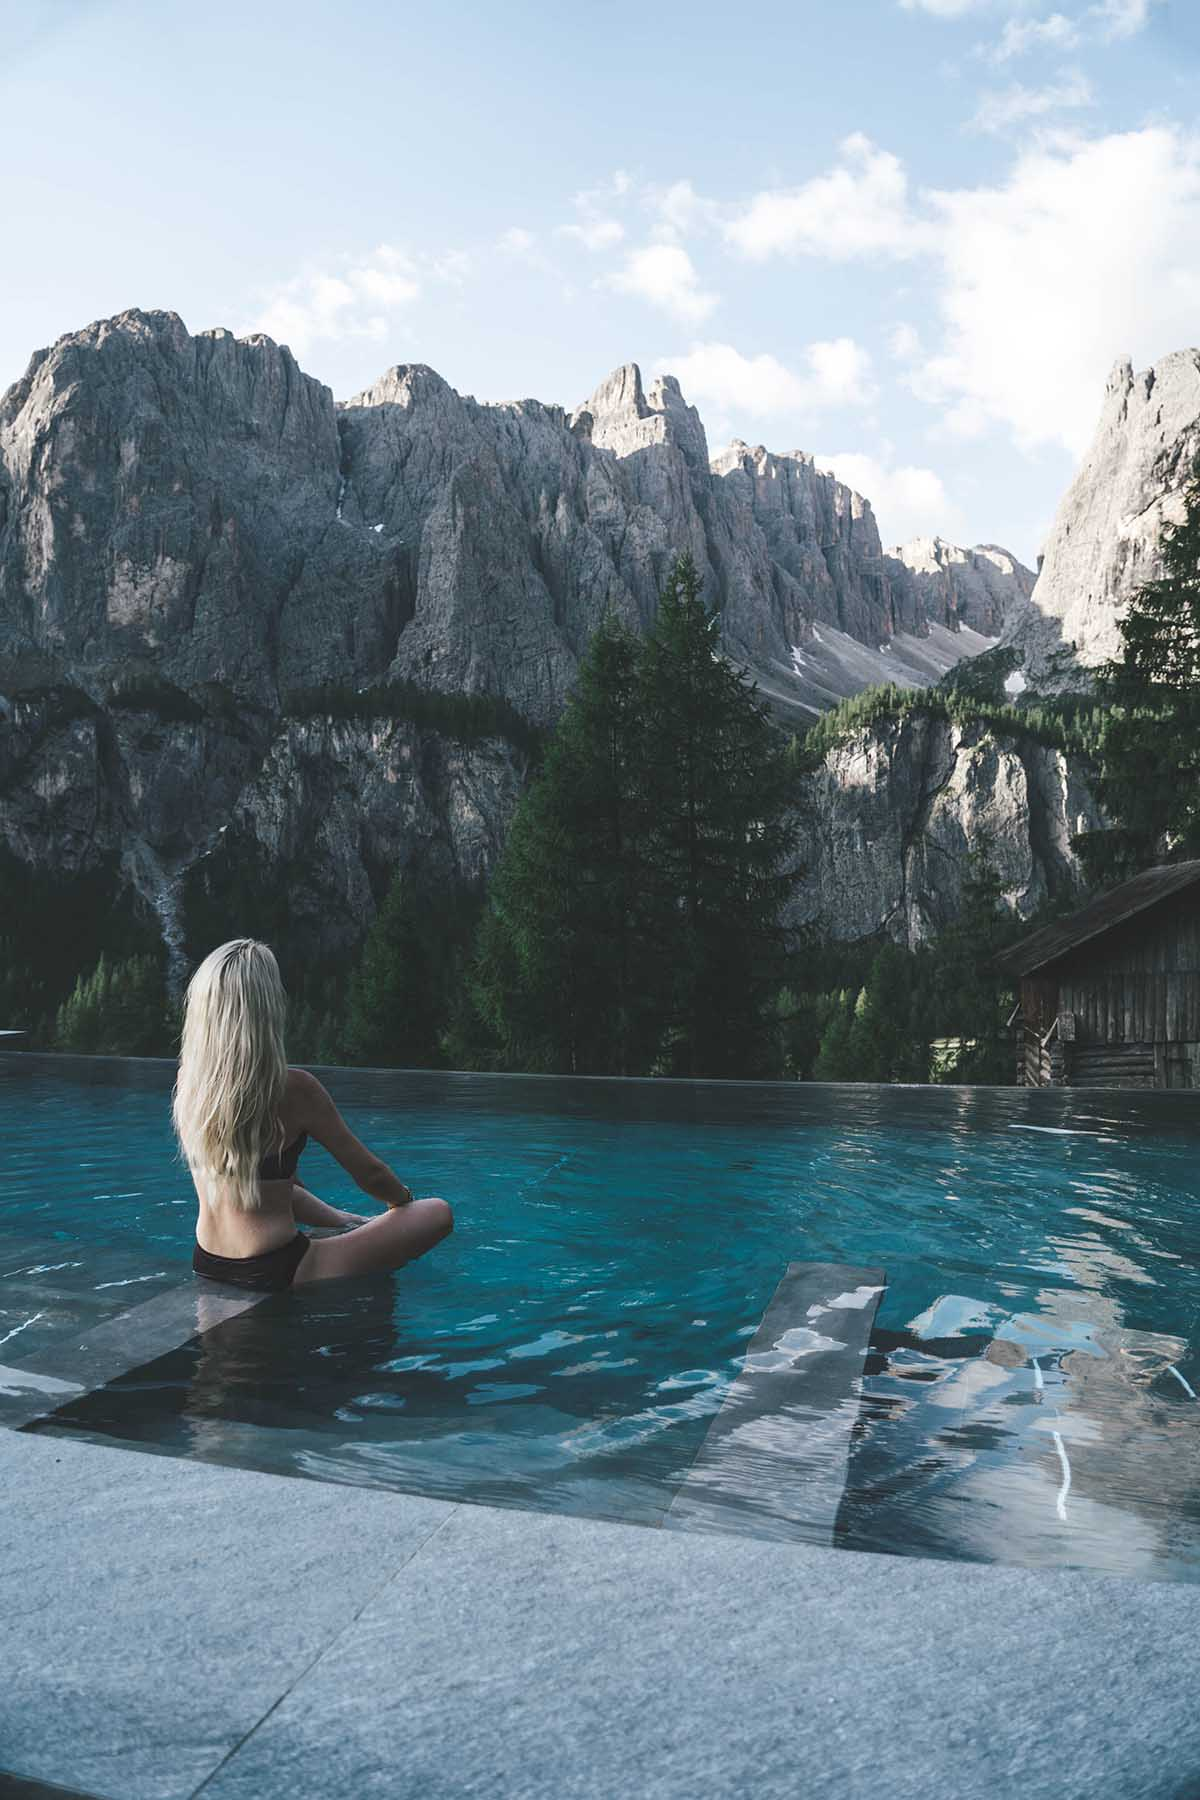 mountain-resort-kolfuschgerhof-dolomiten-frau-infinity-pool-01